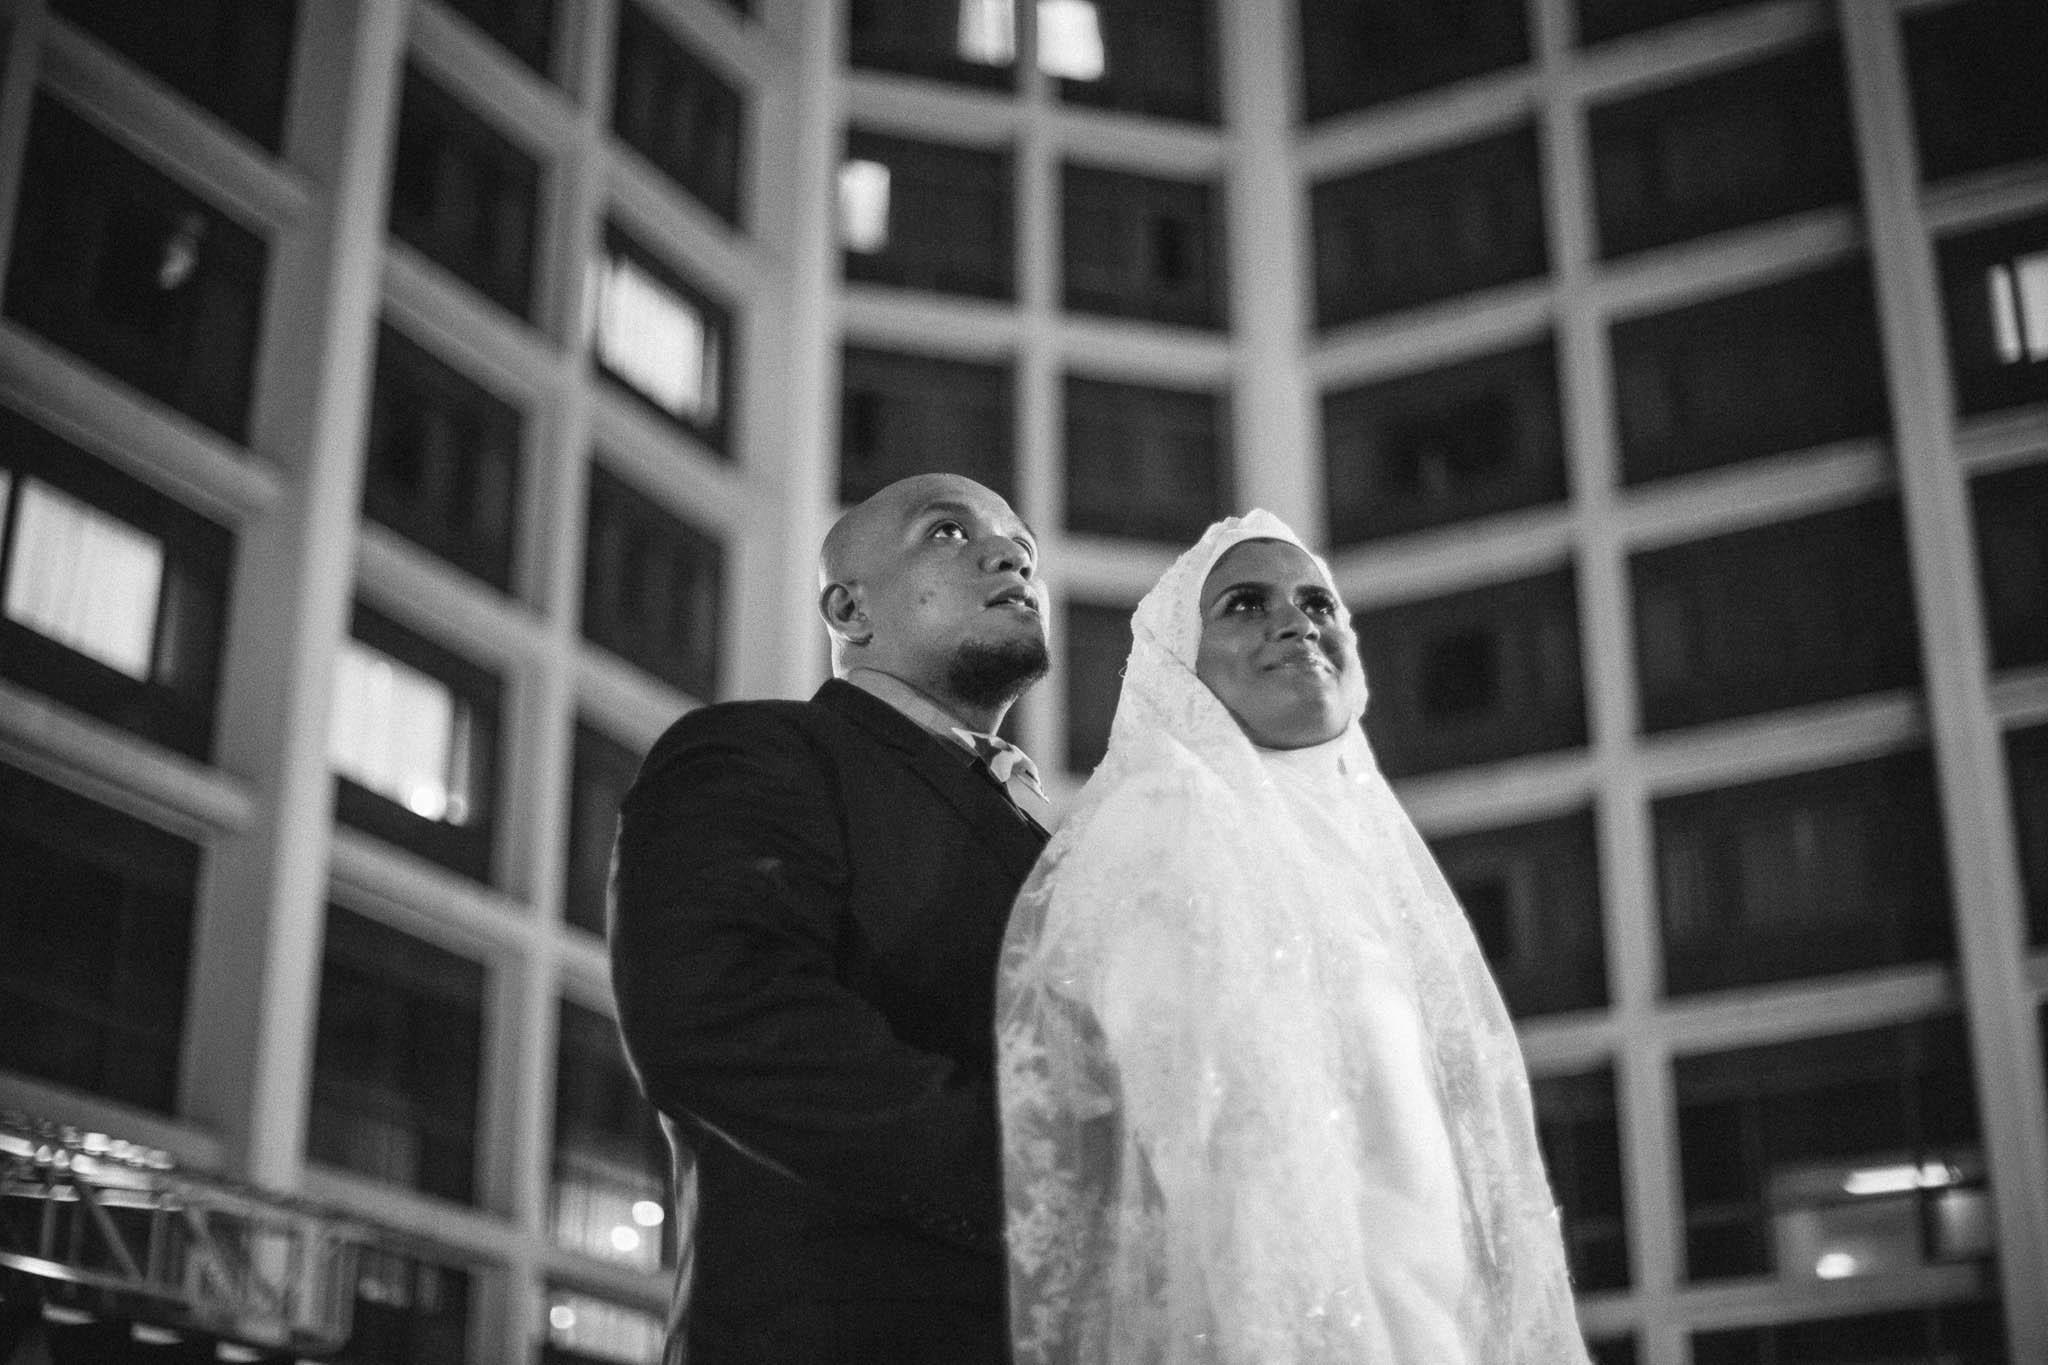 singapore-wedding-photographer-malay-indian-pre-wedding-travel-wmt-2015-shereen-farid-71.jpg